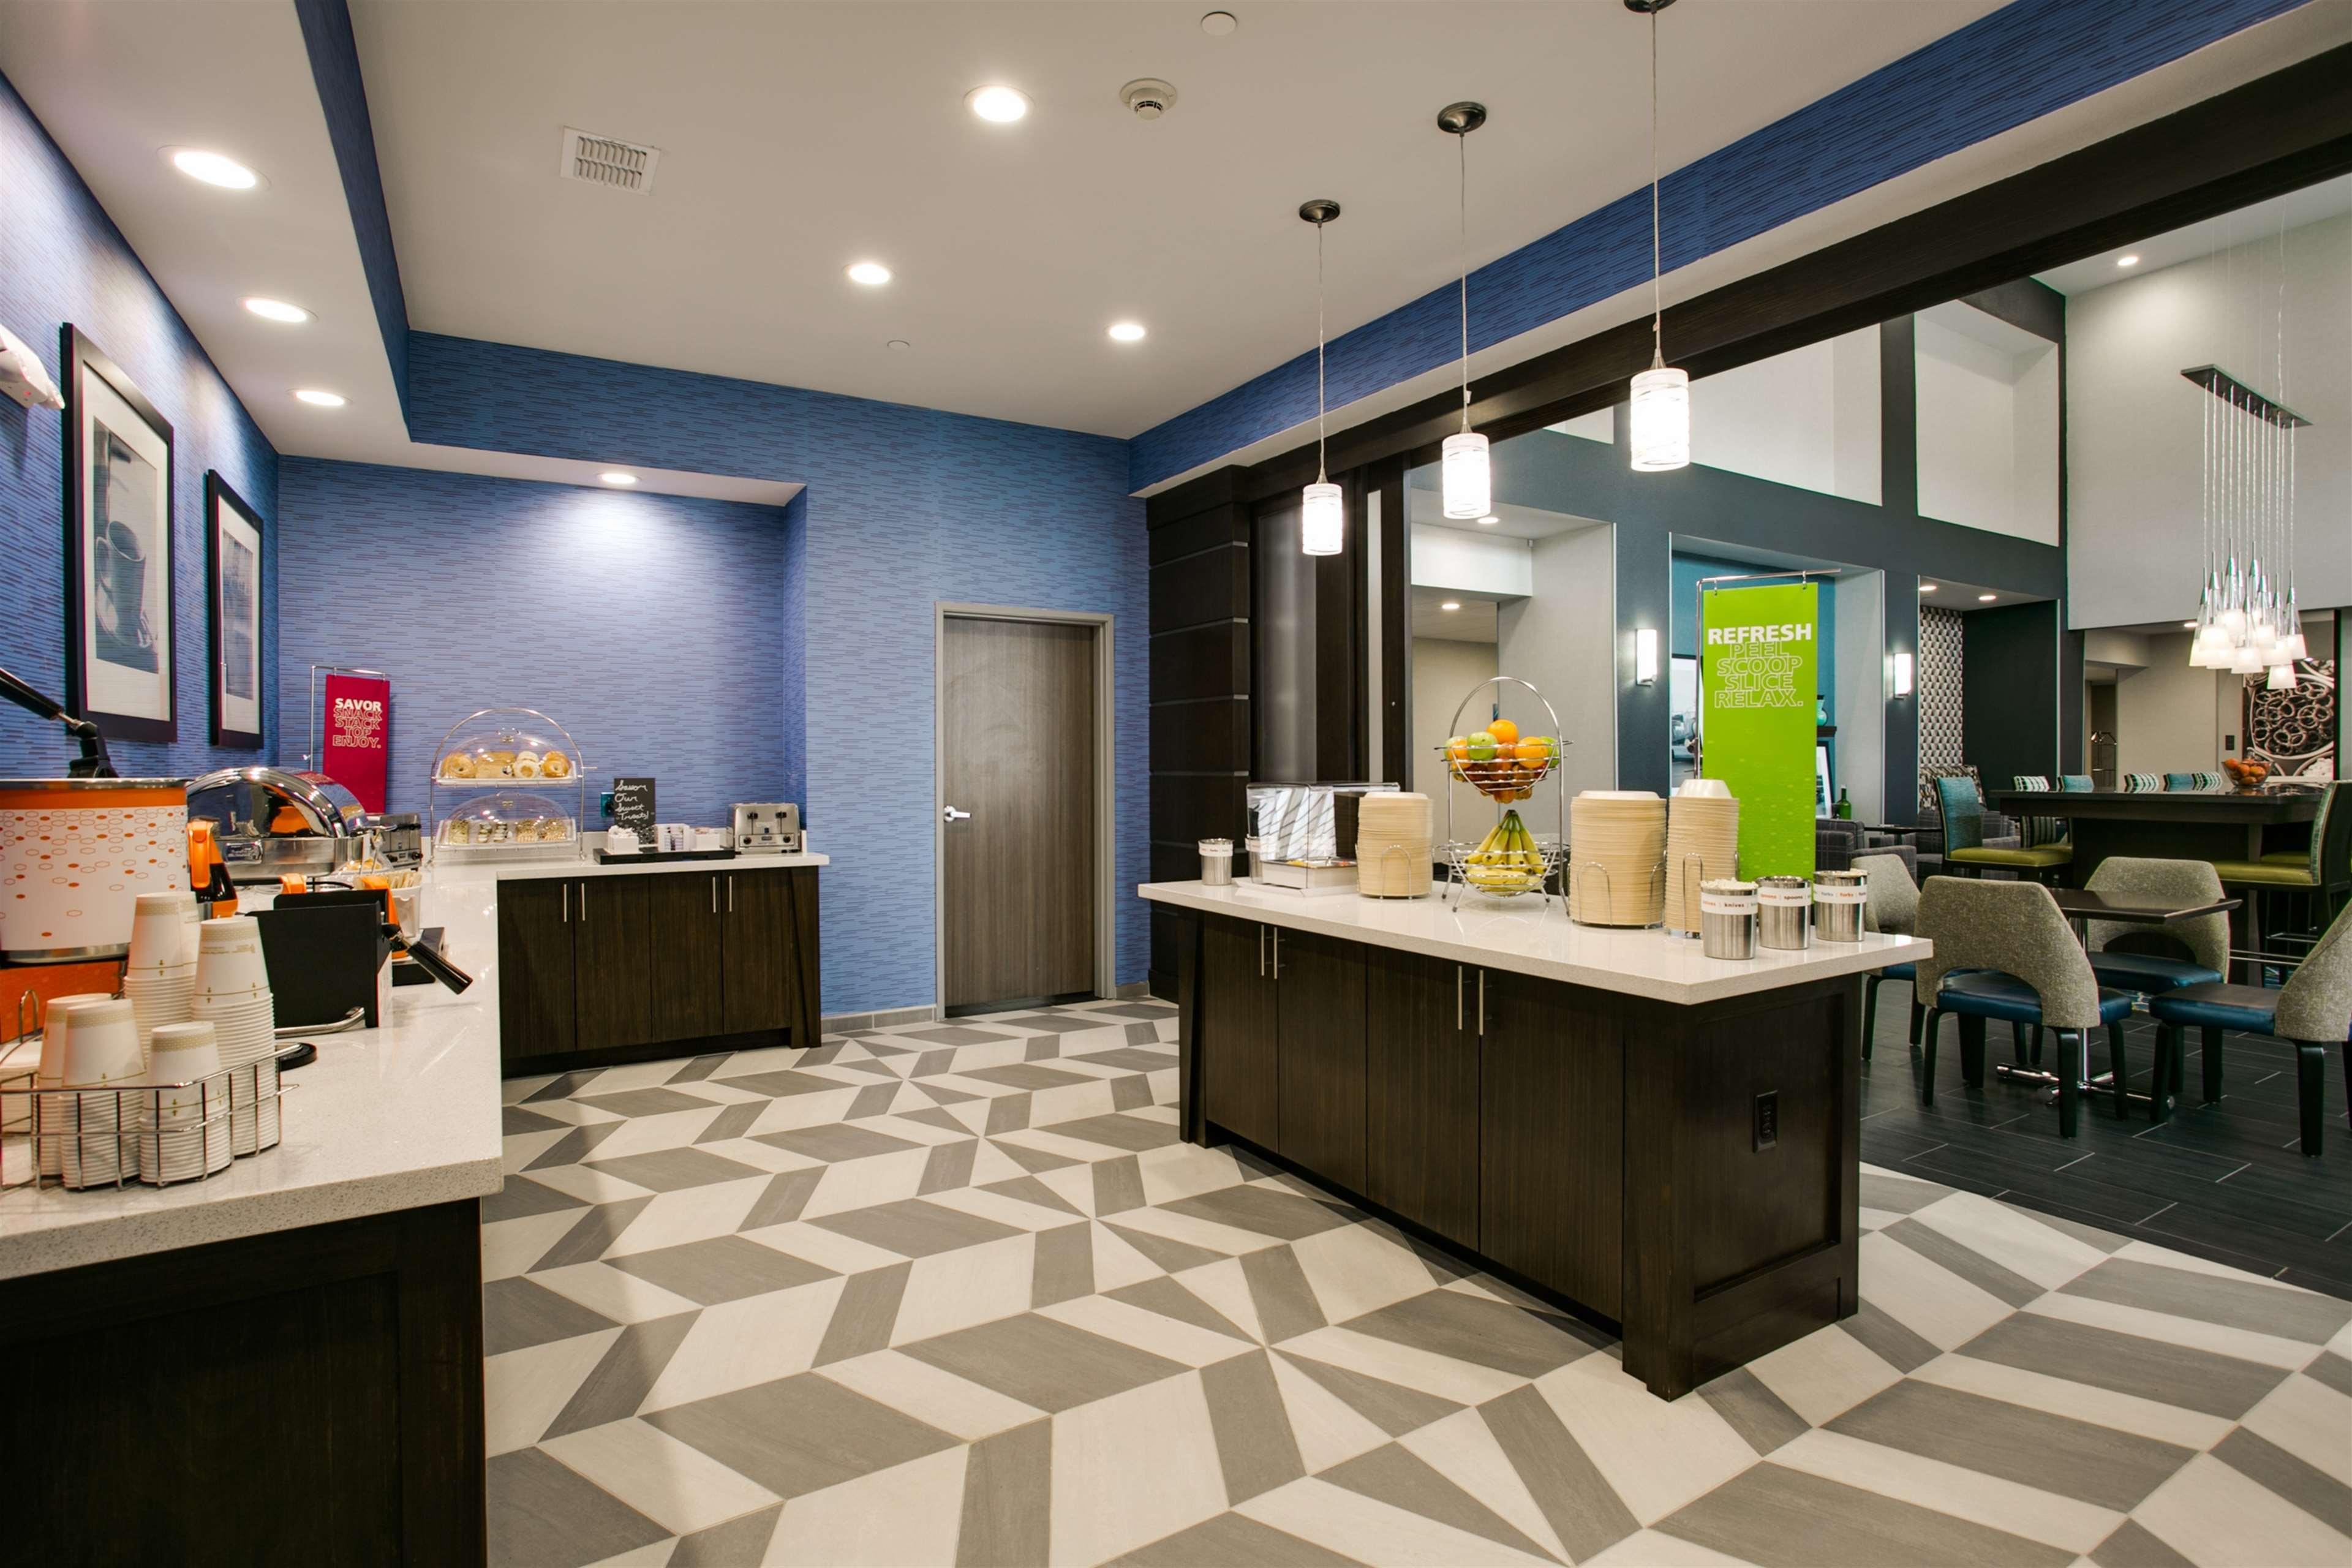 Hampton Inn & Suites Dallas/Ft. Worth Airport South image 11